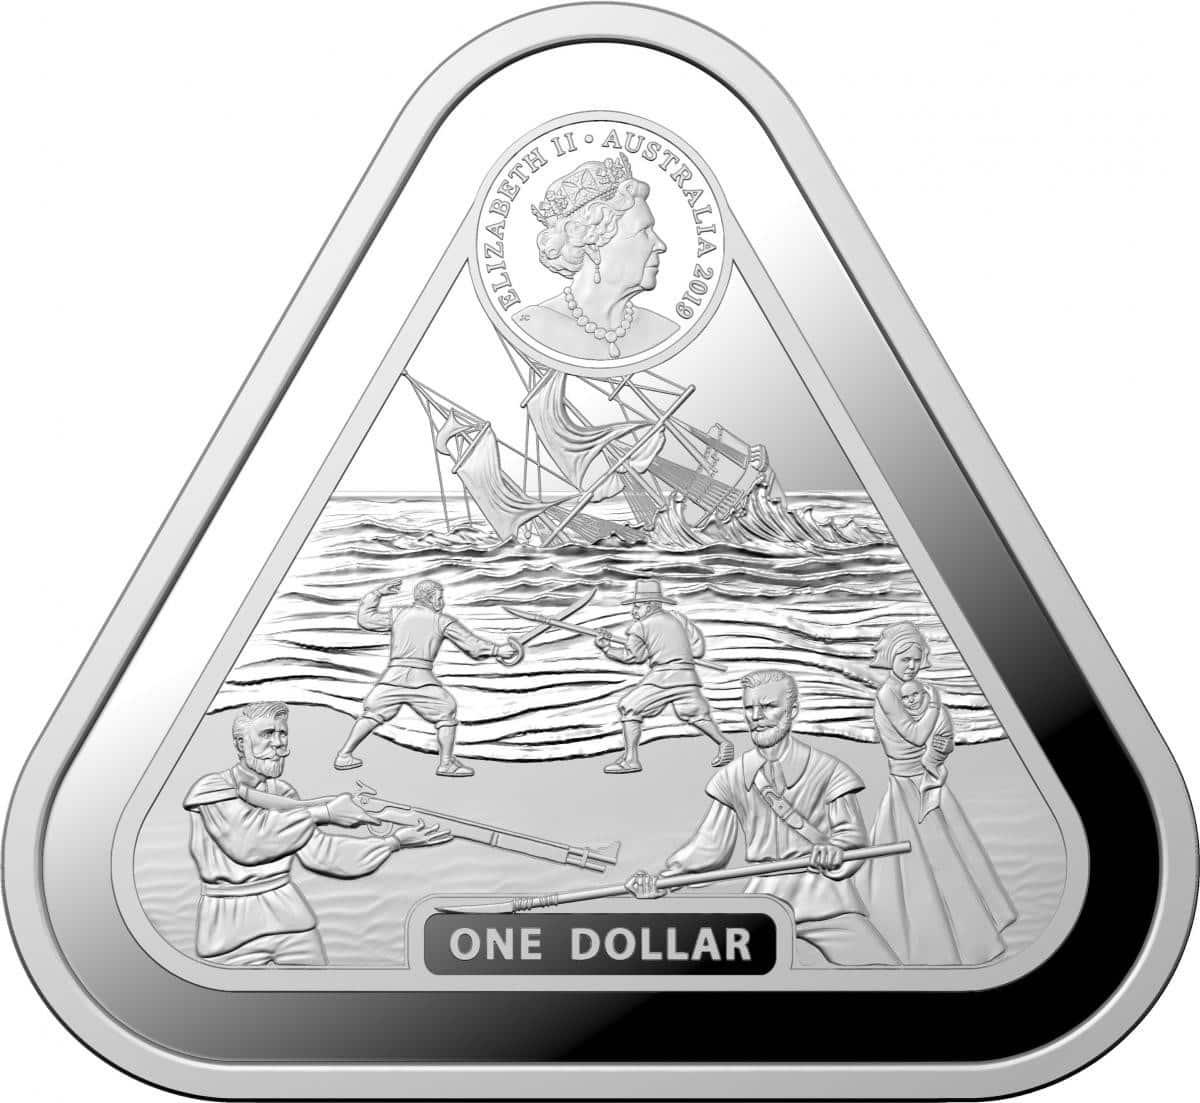 2019 Batavia 1oz Silver Bullion Coin 2